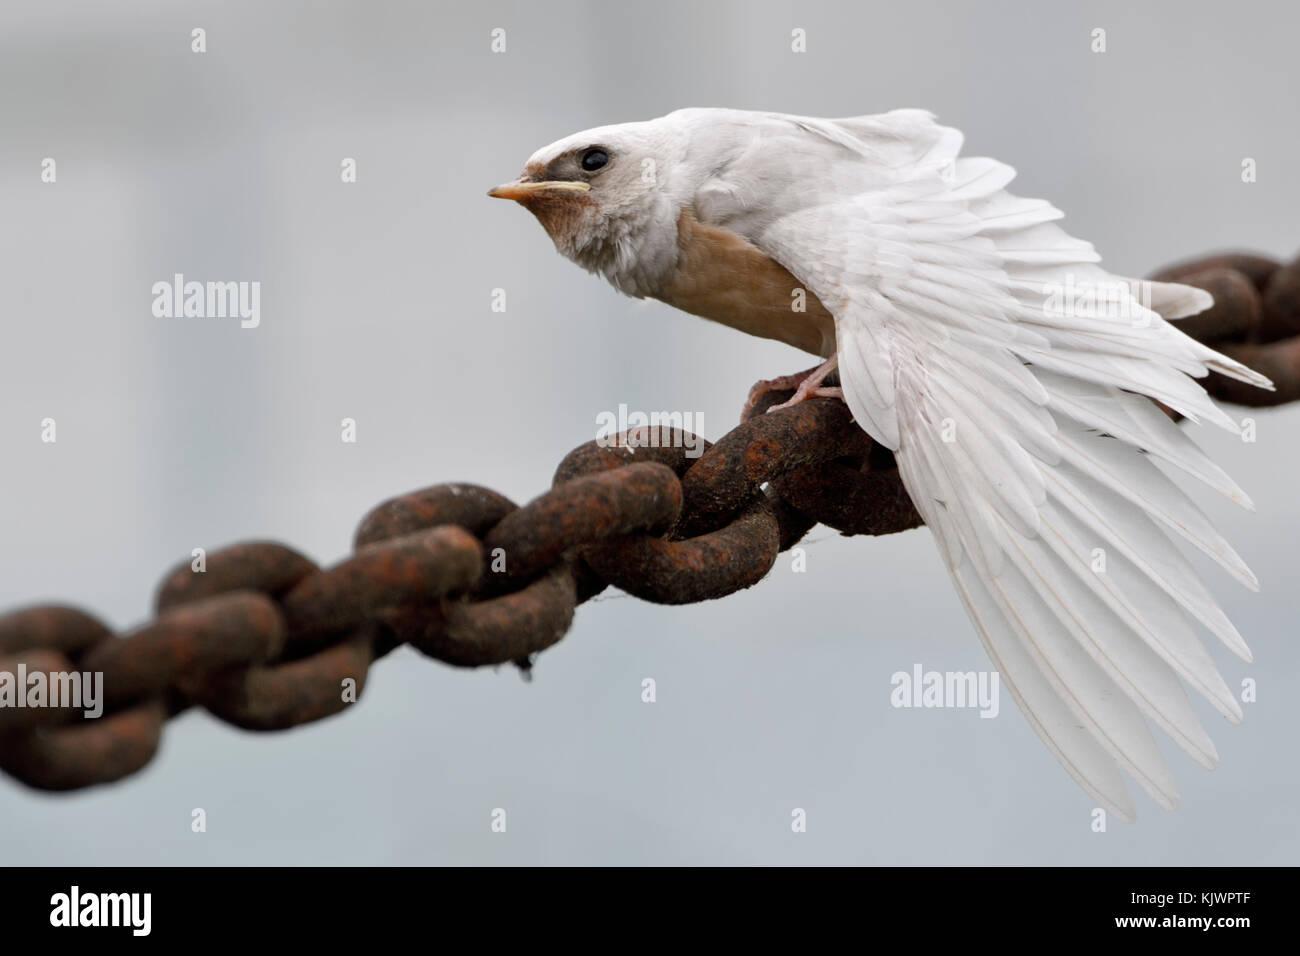 Barn Swallow ( Hirundo rustica ), fledged, rare gene mutation, white plumage, leucistic, leucism, perched on massive - Stock Image